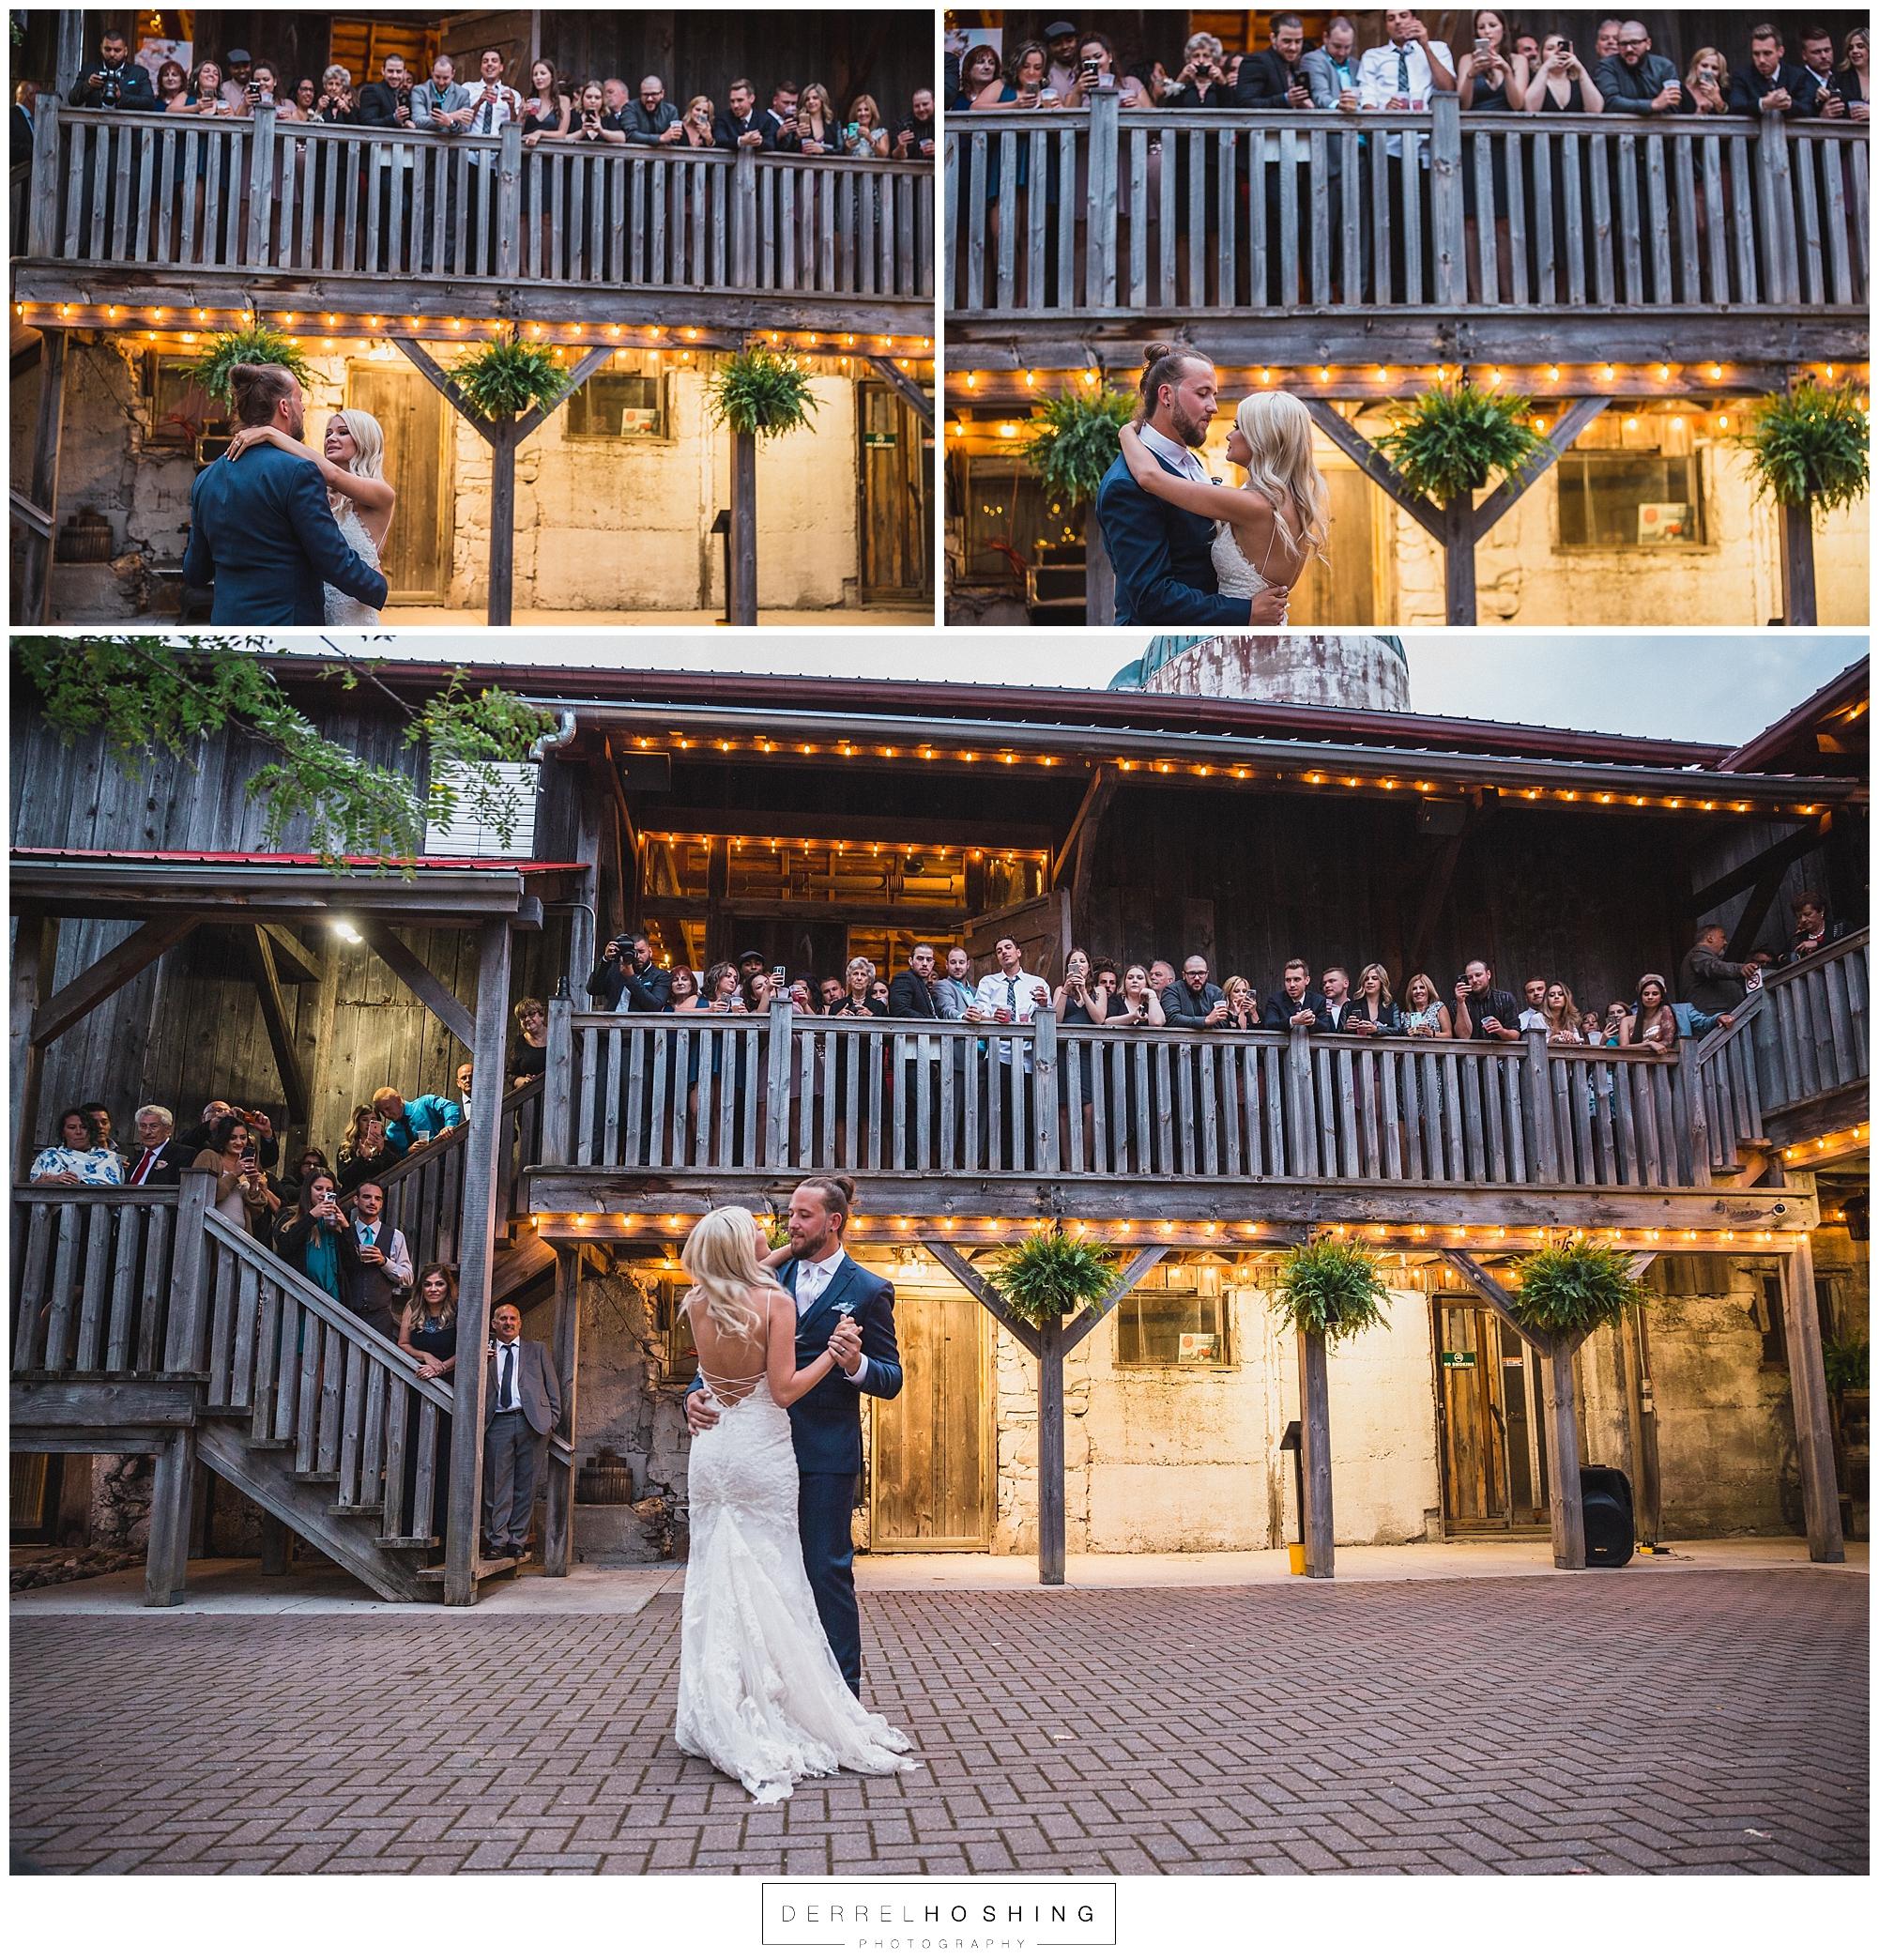 Belcroft-Estates-&-Event-Centre-Wedding-Innisfil-Ontario-0033.jpg